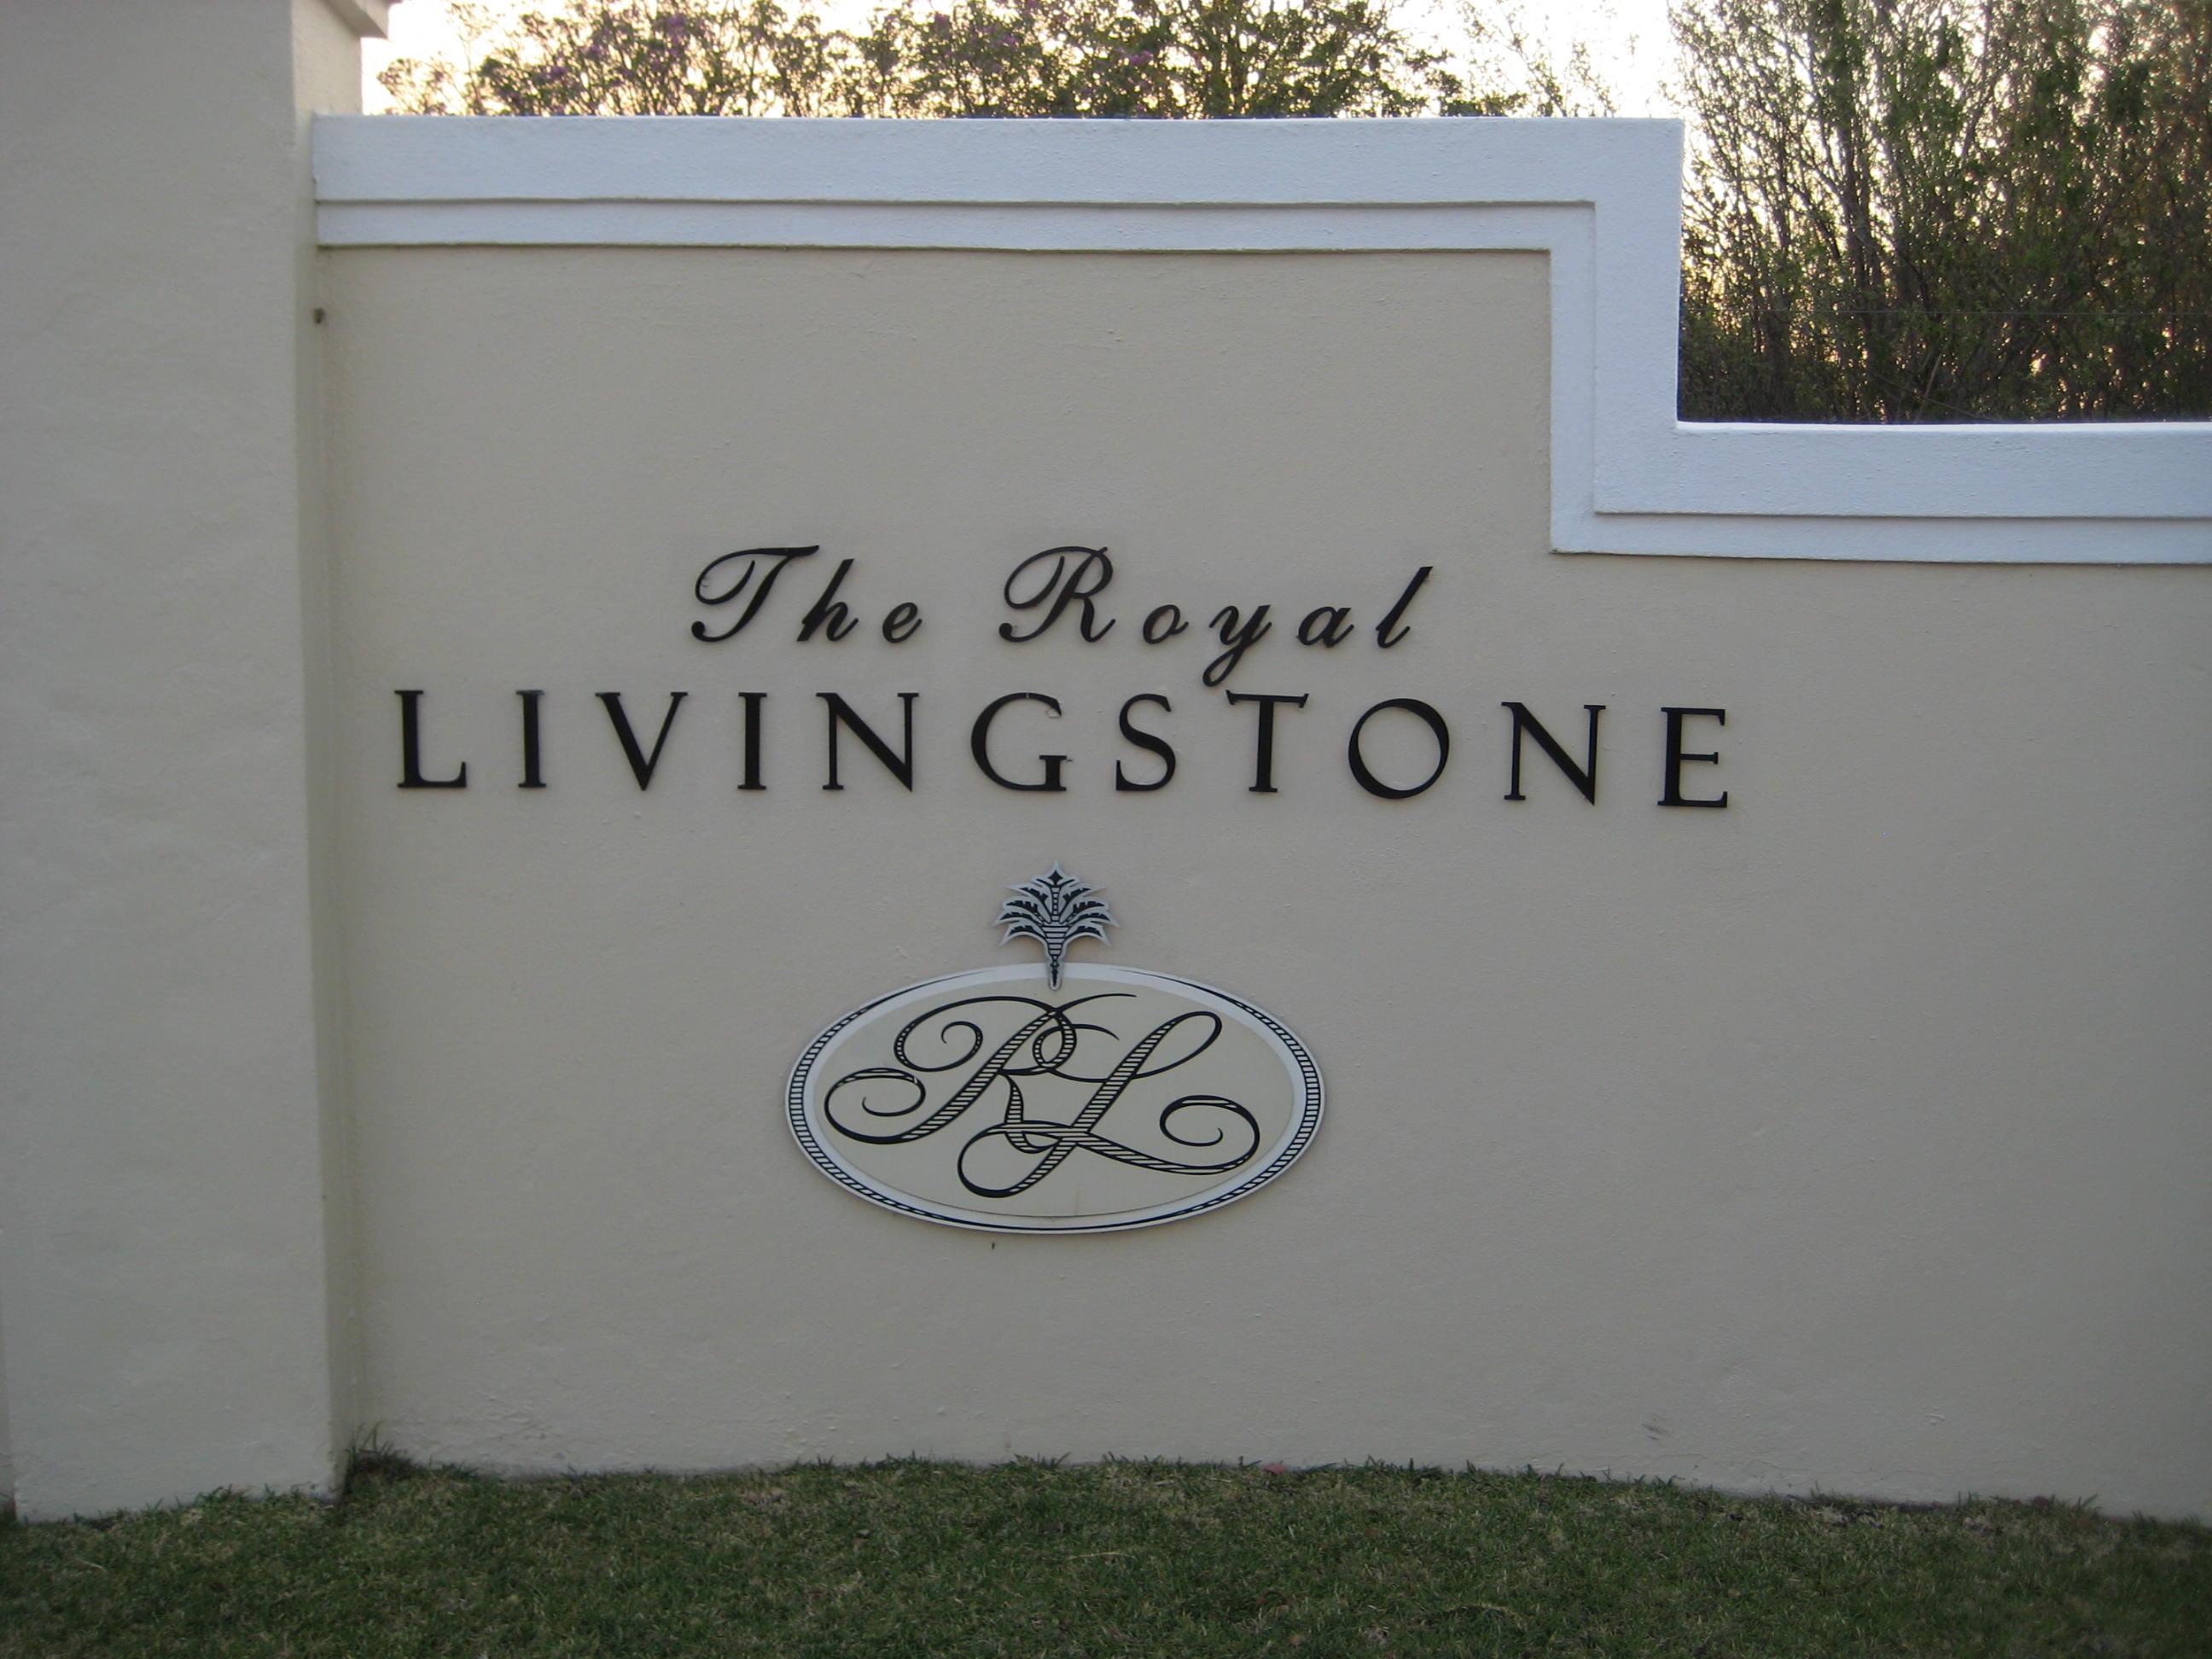 The Royal Livinstone